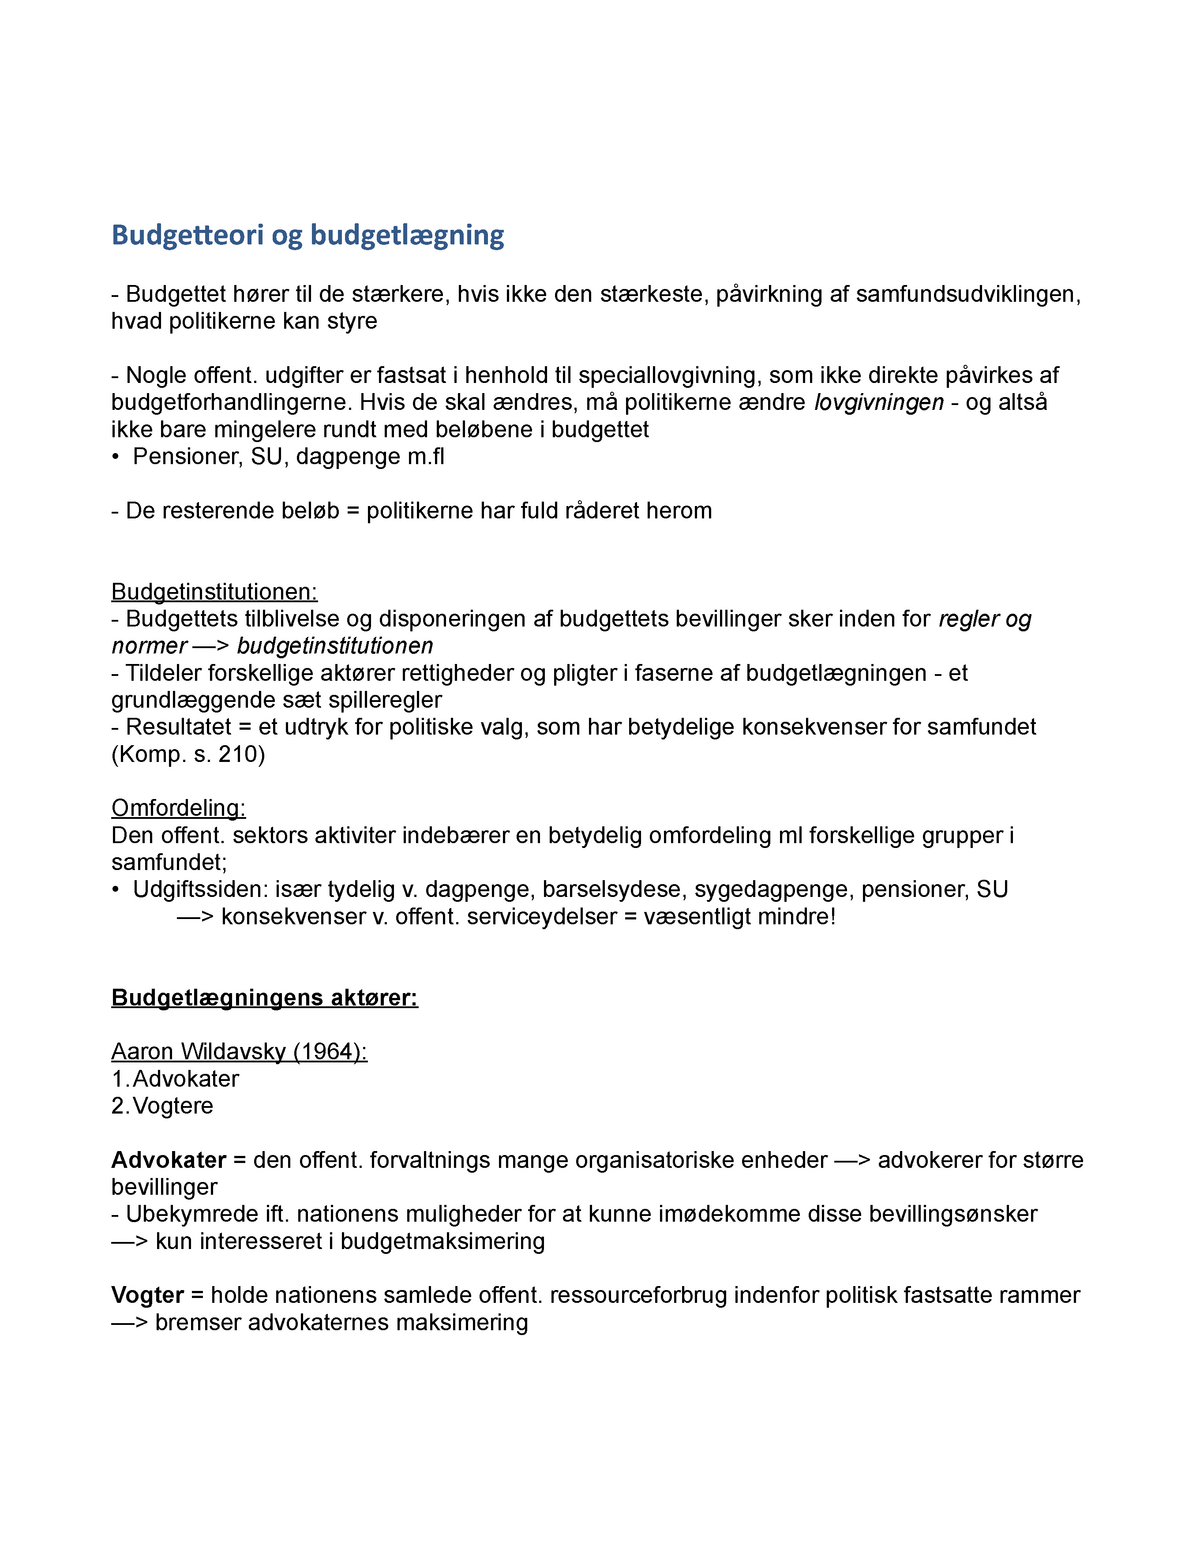 a619fd79acc Budgetteori og budgetlægning - ASTB05001U: Politologisk grundkursus -  StuDocu